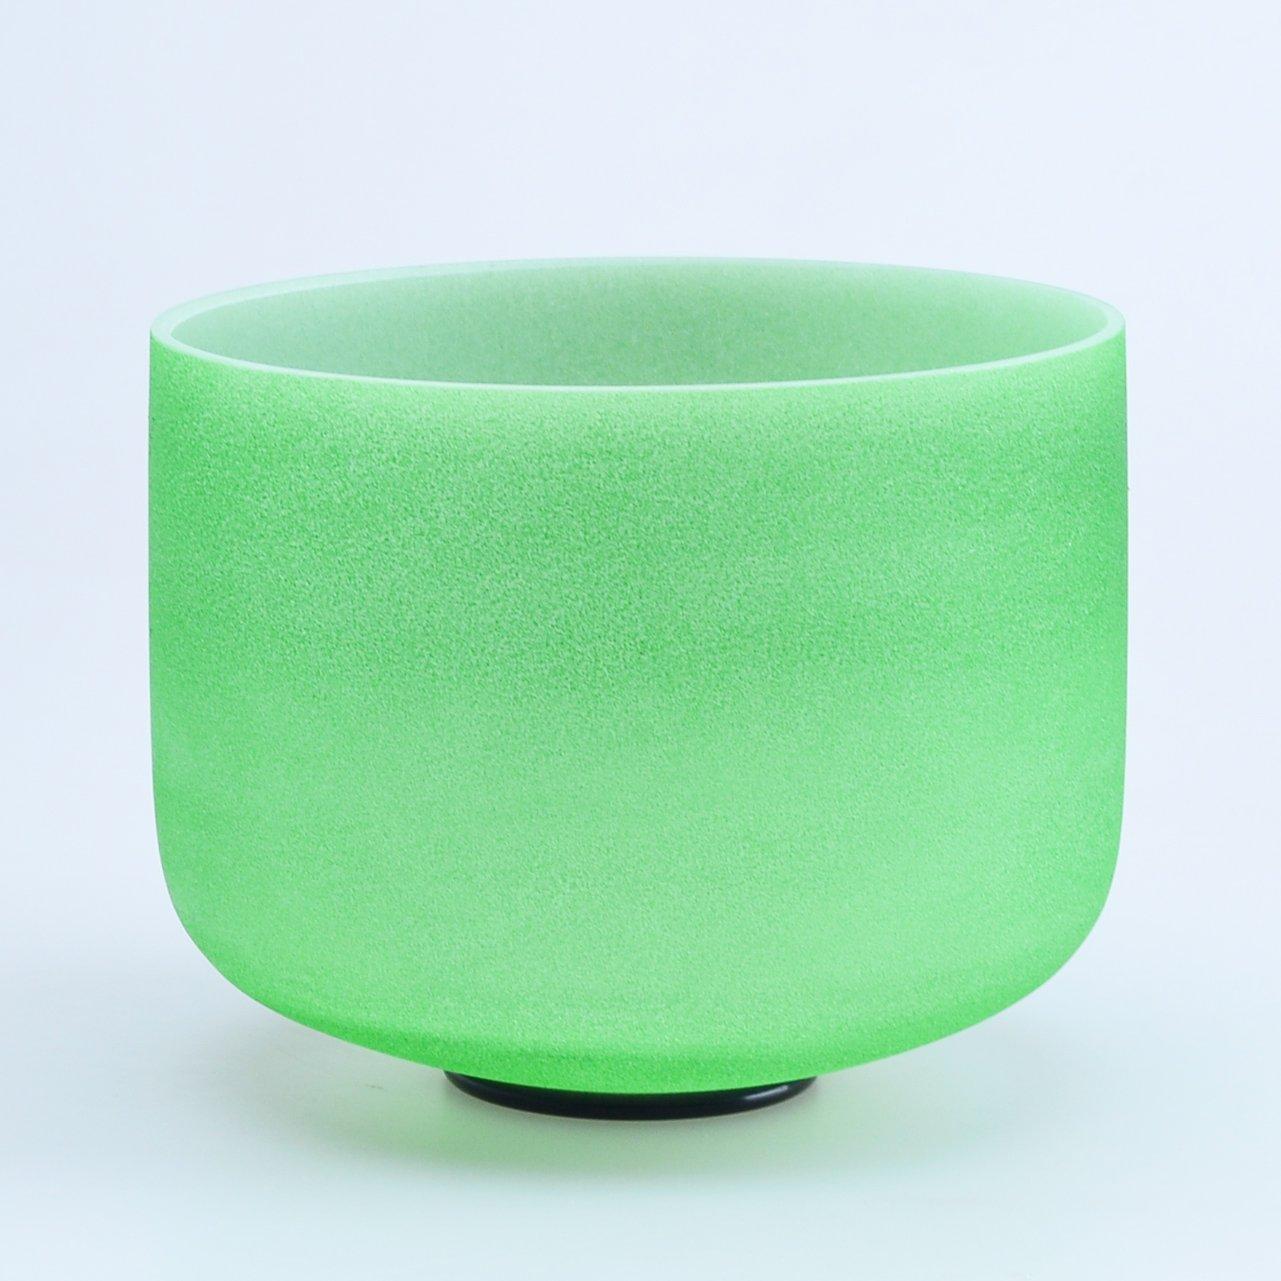 440HZ 8'' F Heart Green Chakra Quartz Crystal Singing Bowl by Donghai Quartz